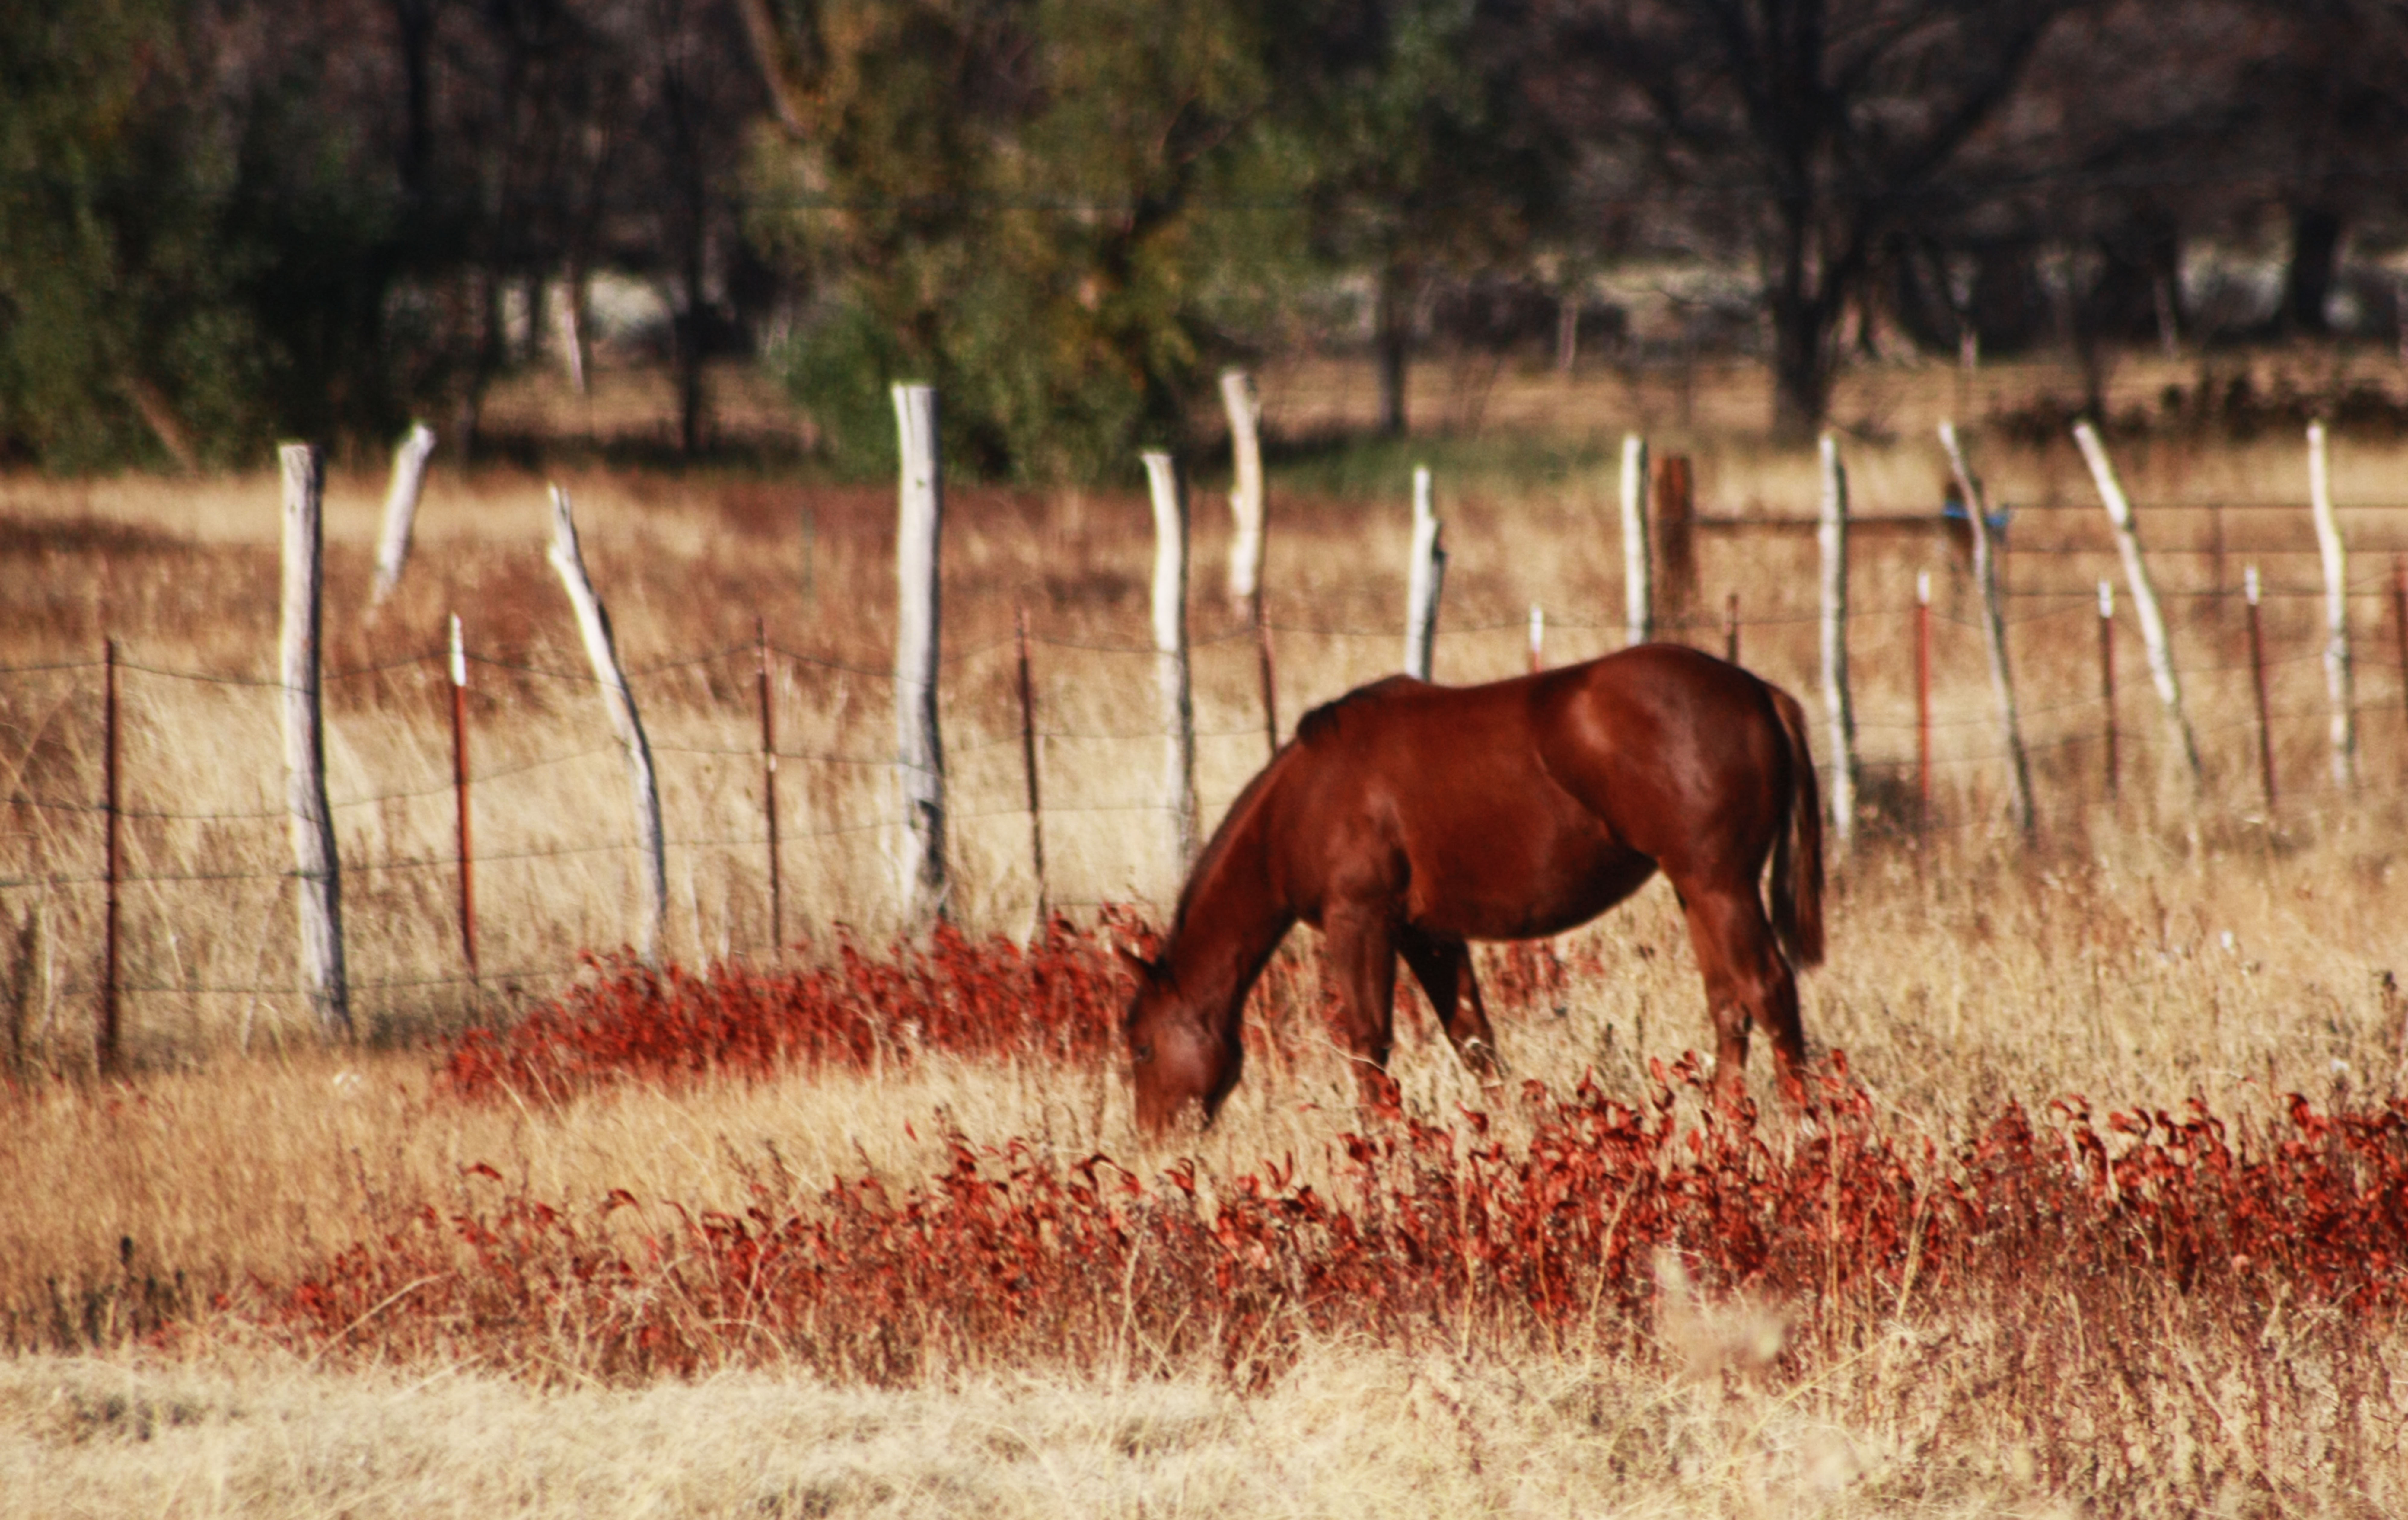 Horse grazing - Big Pine, CA